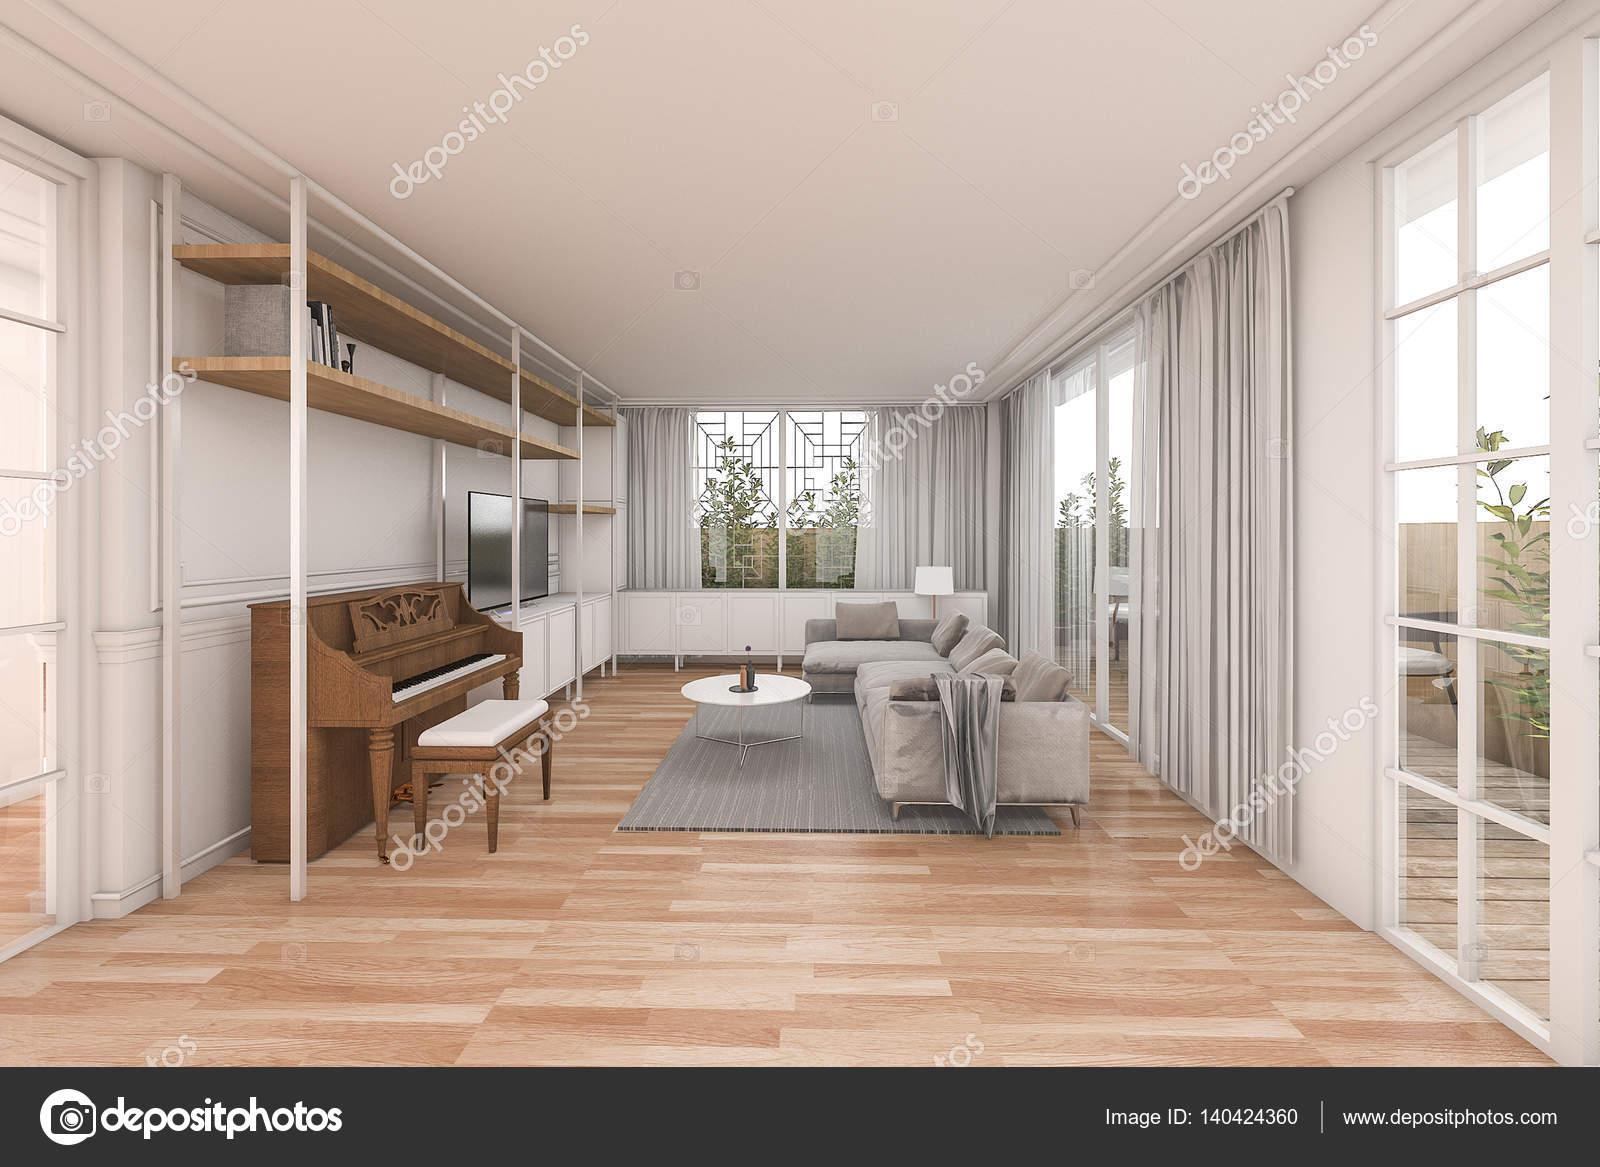 3D rendering mooie houten woonkamer met mooie meubels in wit huis ...